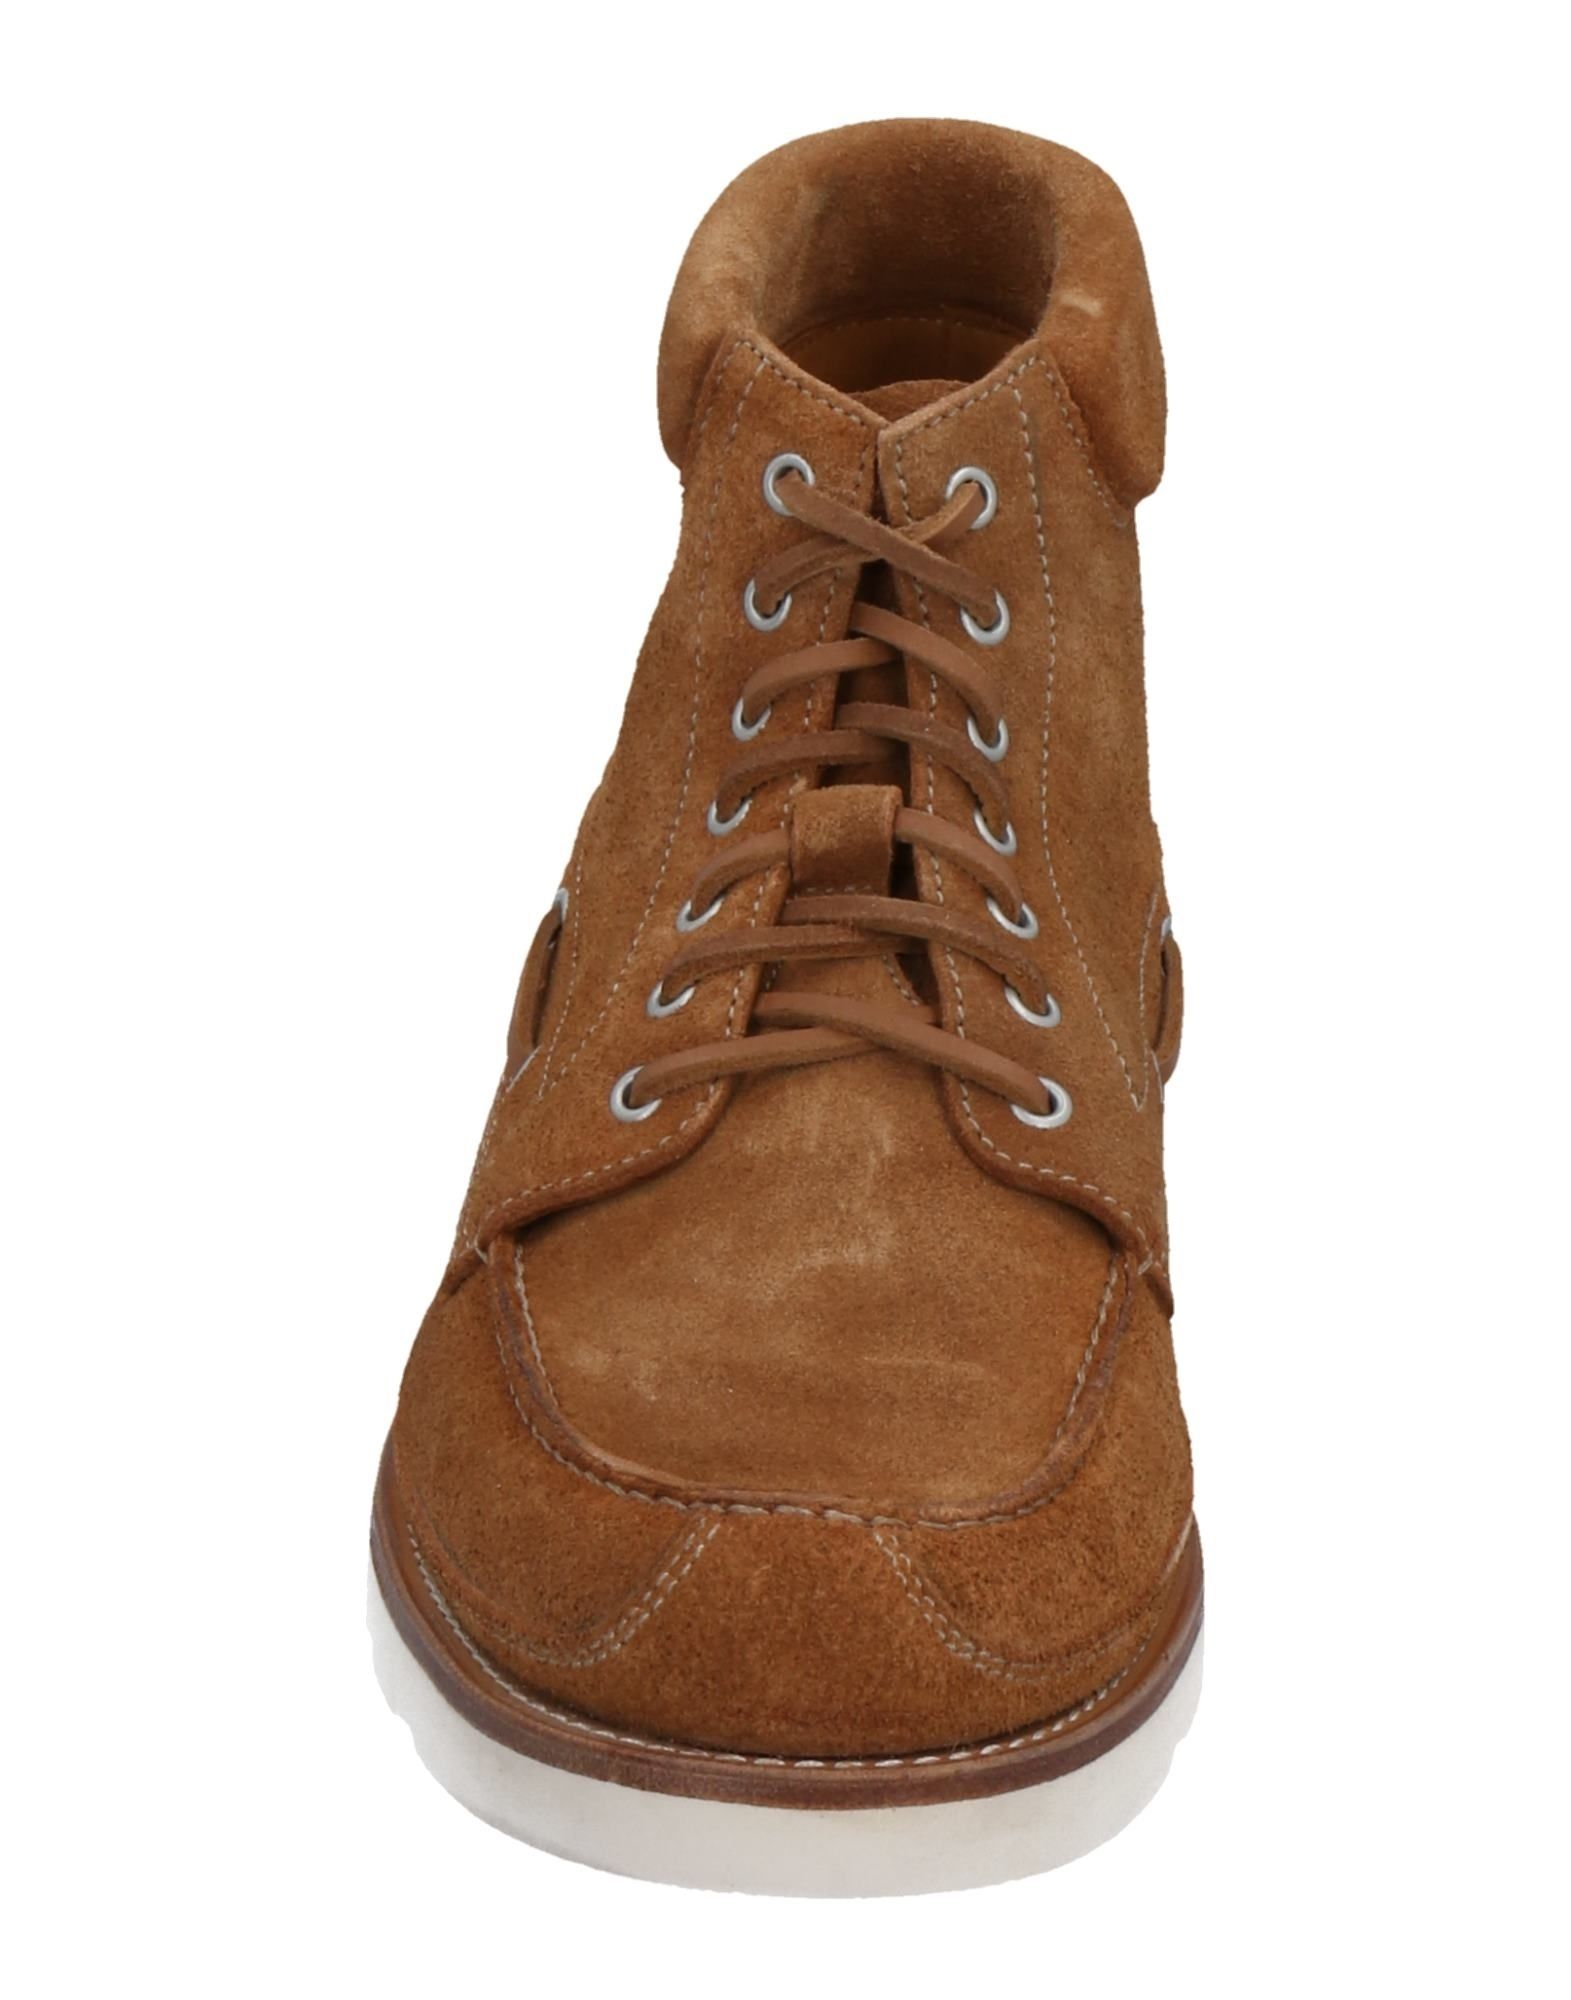 N.D.C. Made By By Made Hand Stiefelette Herren  11517480WH Gute Qualität beliebte Schuhe bb4c3a